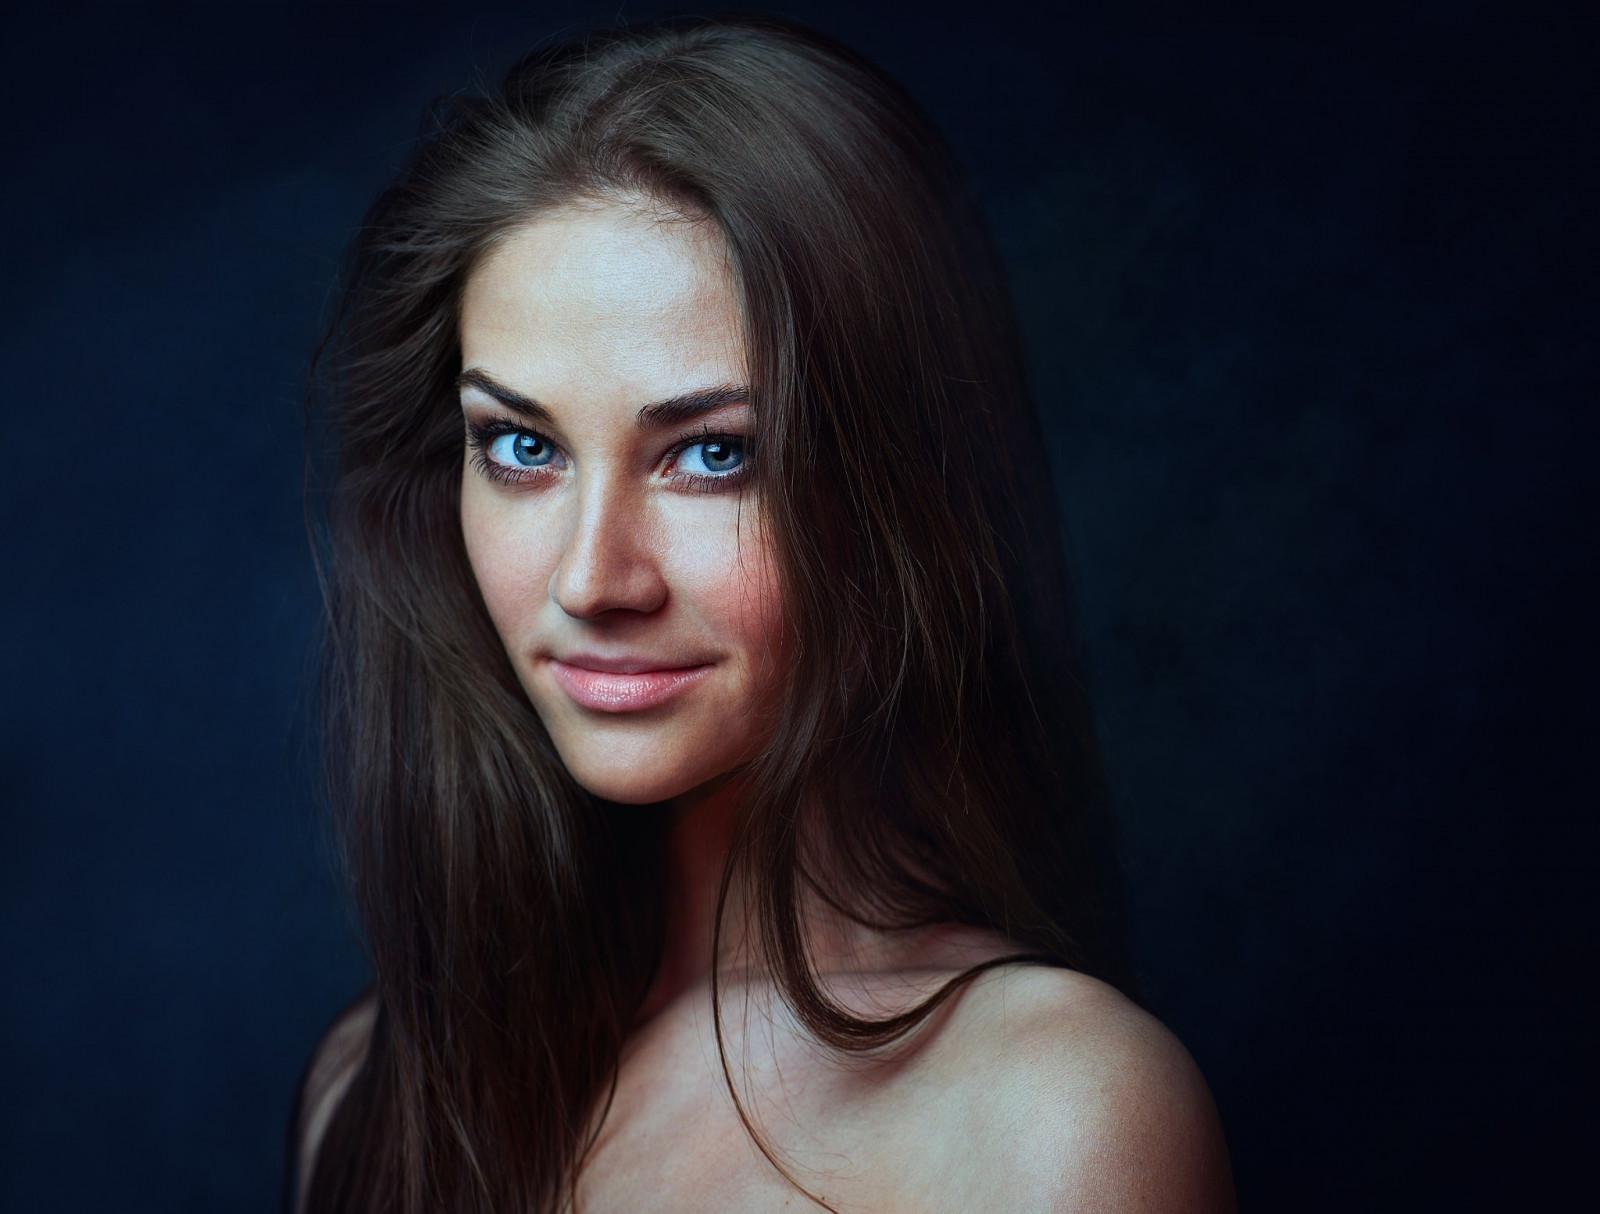 Wallpaper Face Women Model Long Hair Blue Eyes: Wallpaper : Face, Women, Simple Background, Long Hair